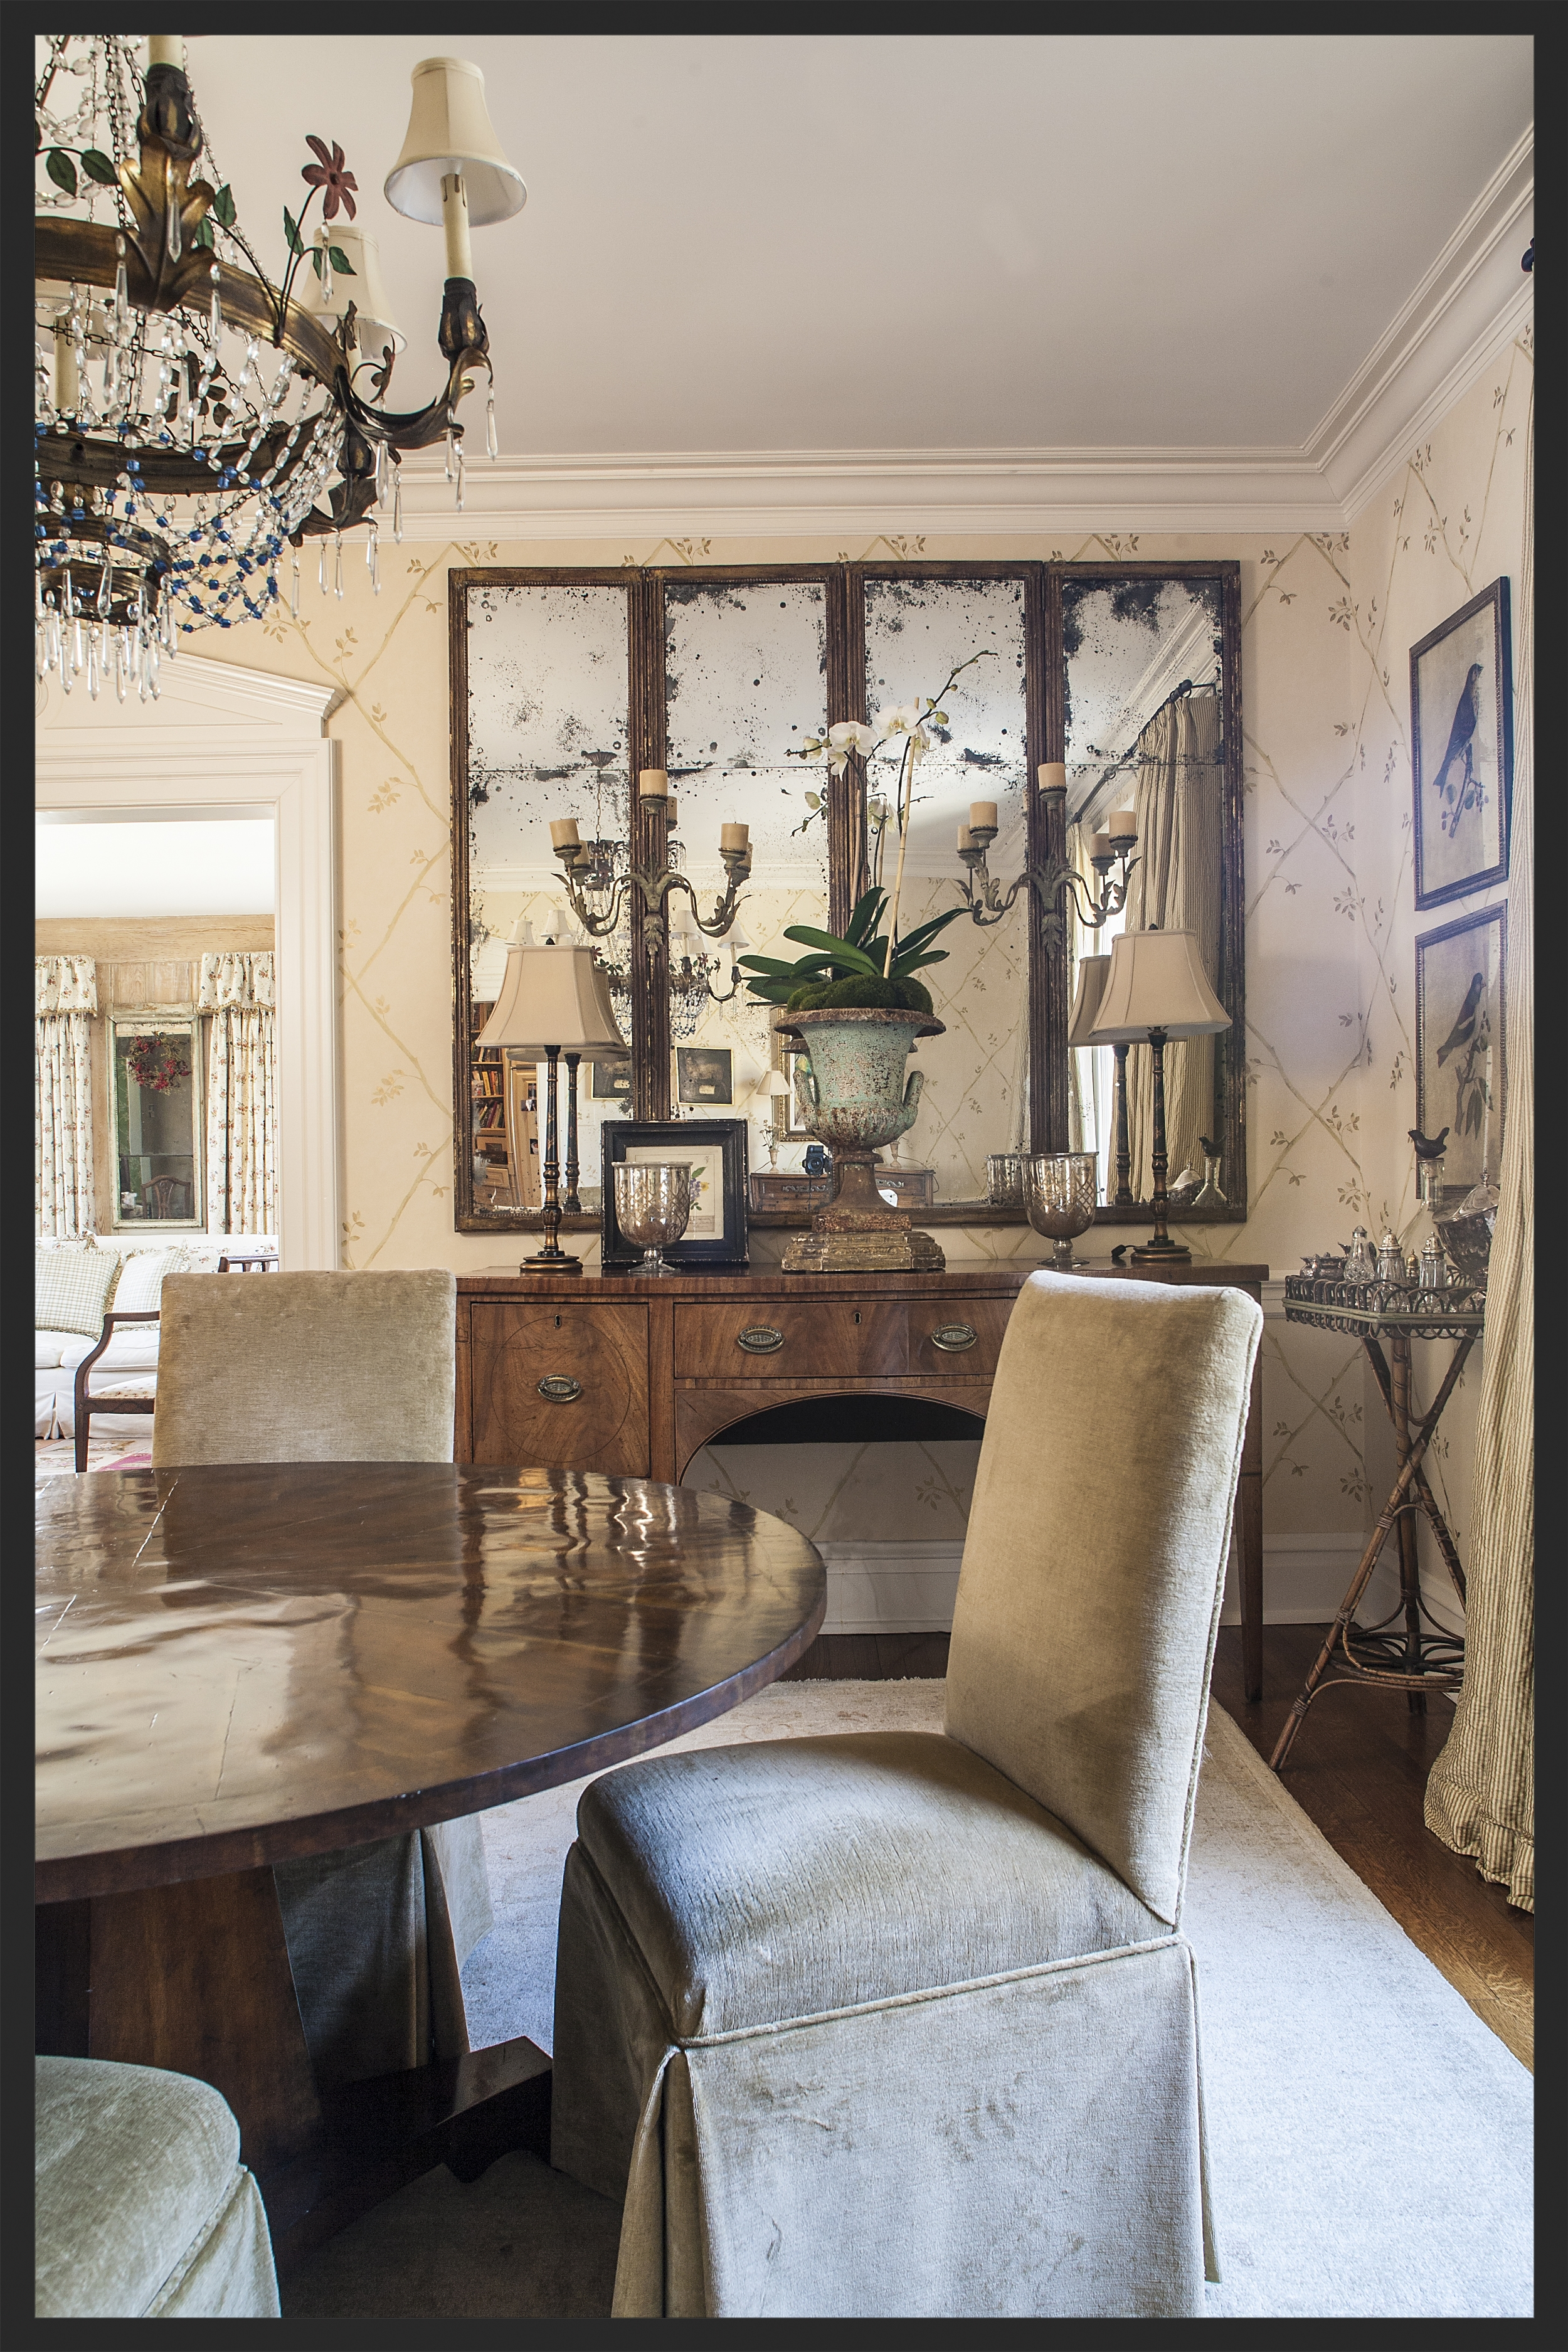 Beautiful English Mahogany sideboard.  Folding mirrored screen hangs above the buffet.  Linda Kay McCloy - alittleenglishinteriors.com